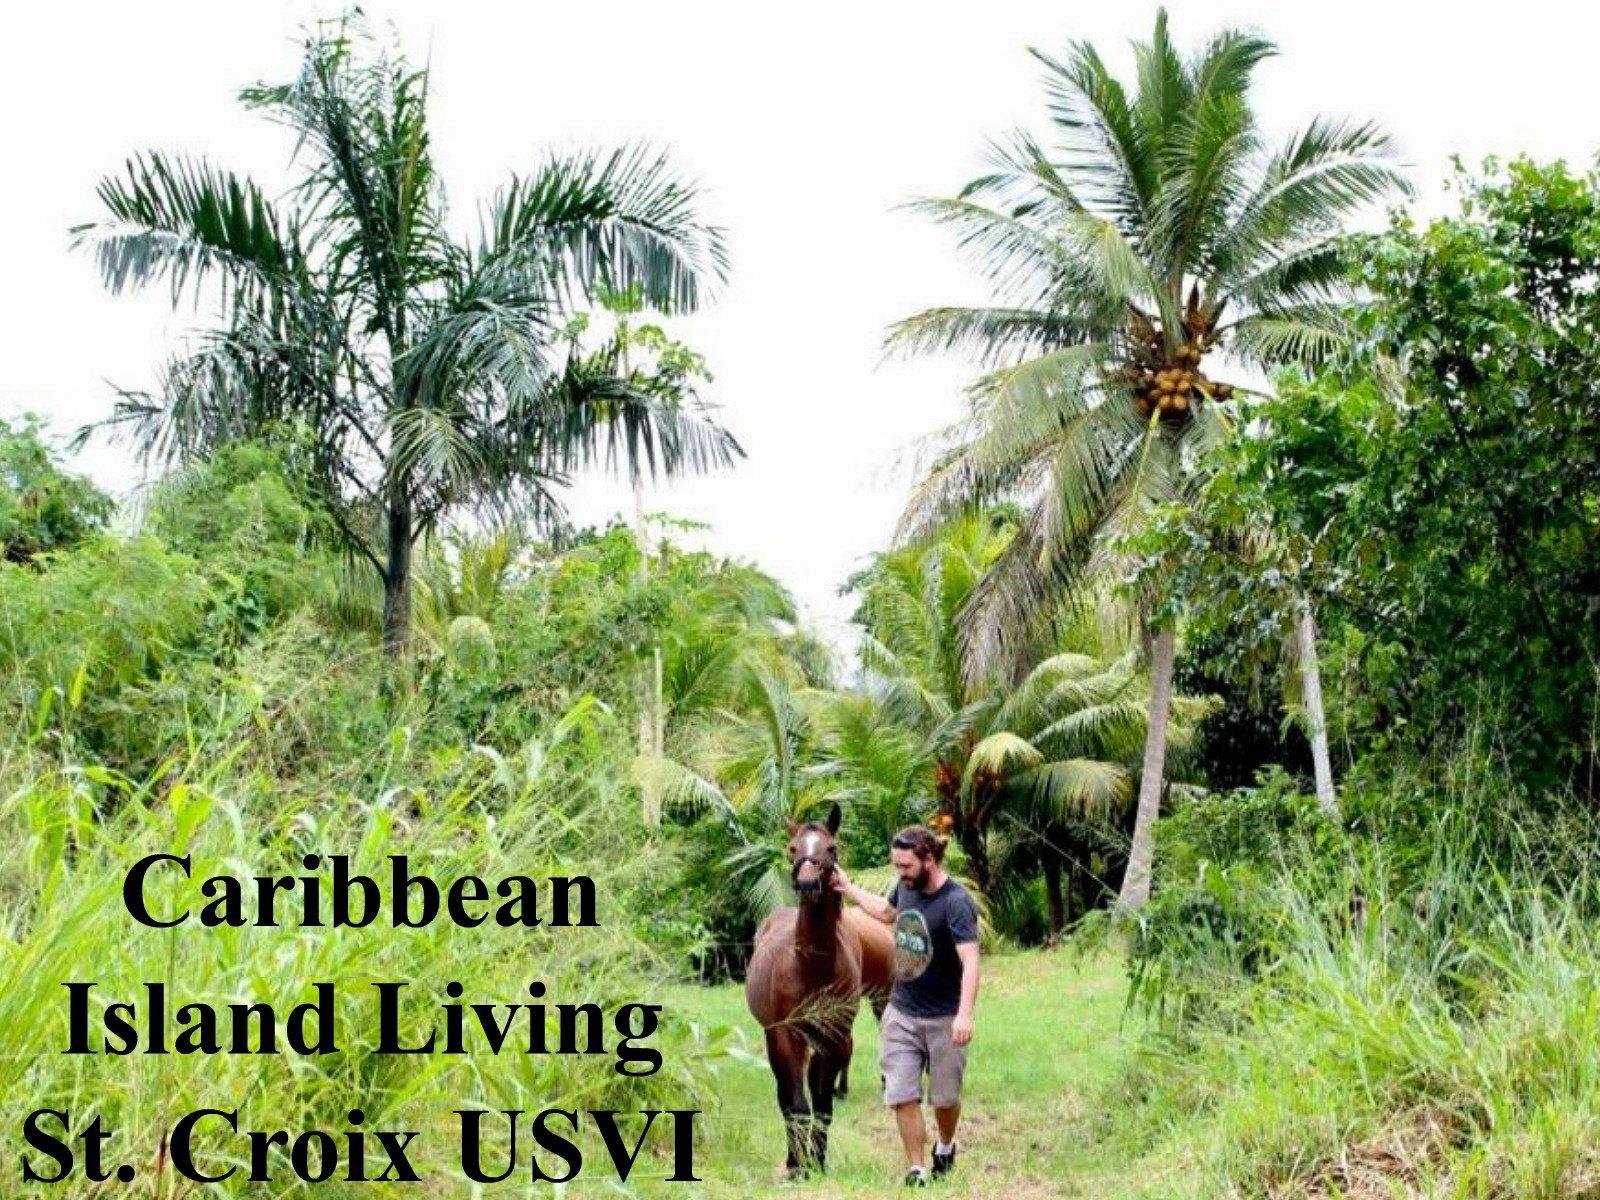 Caribbean Island Living St. Croix USVI - Season 1